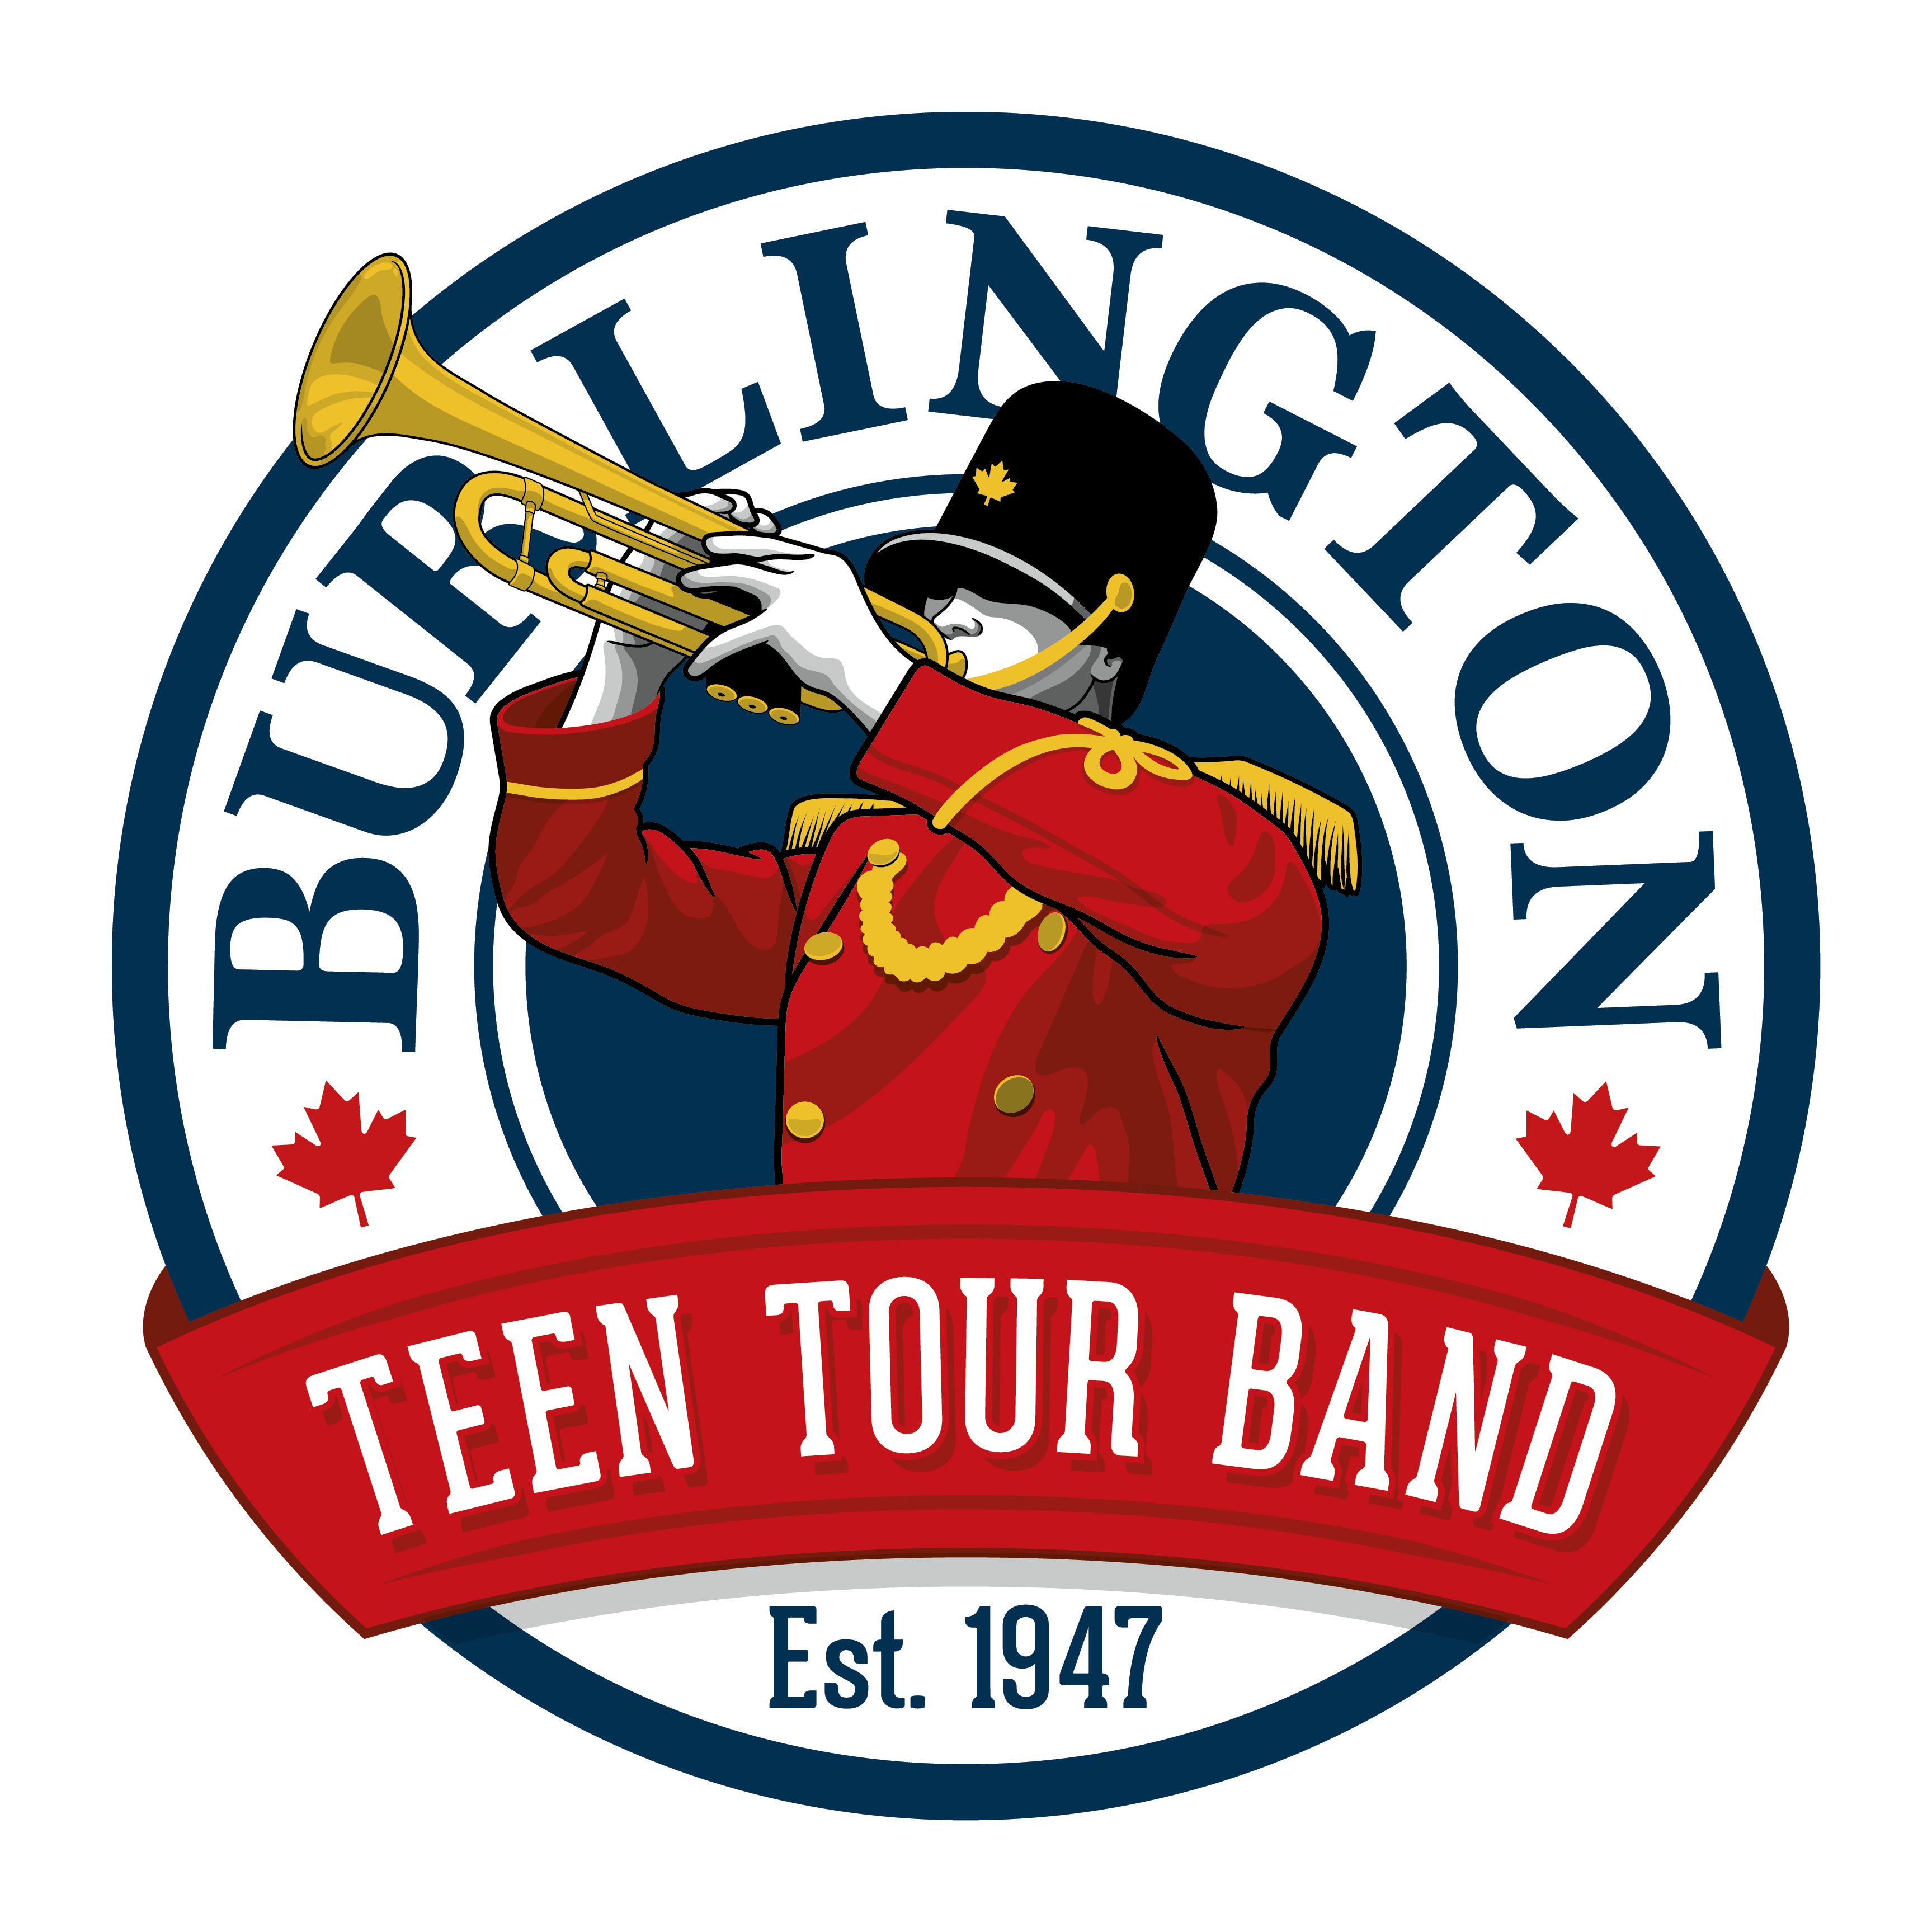 Burlington tour band . Teen clipart junior high